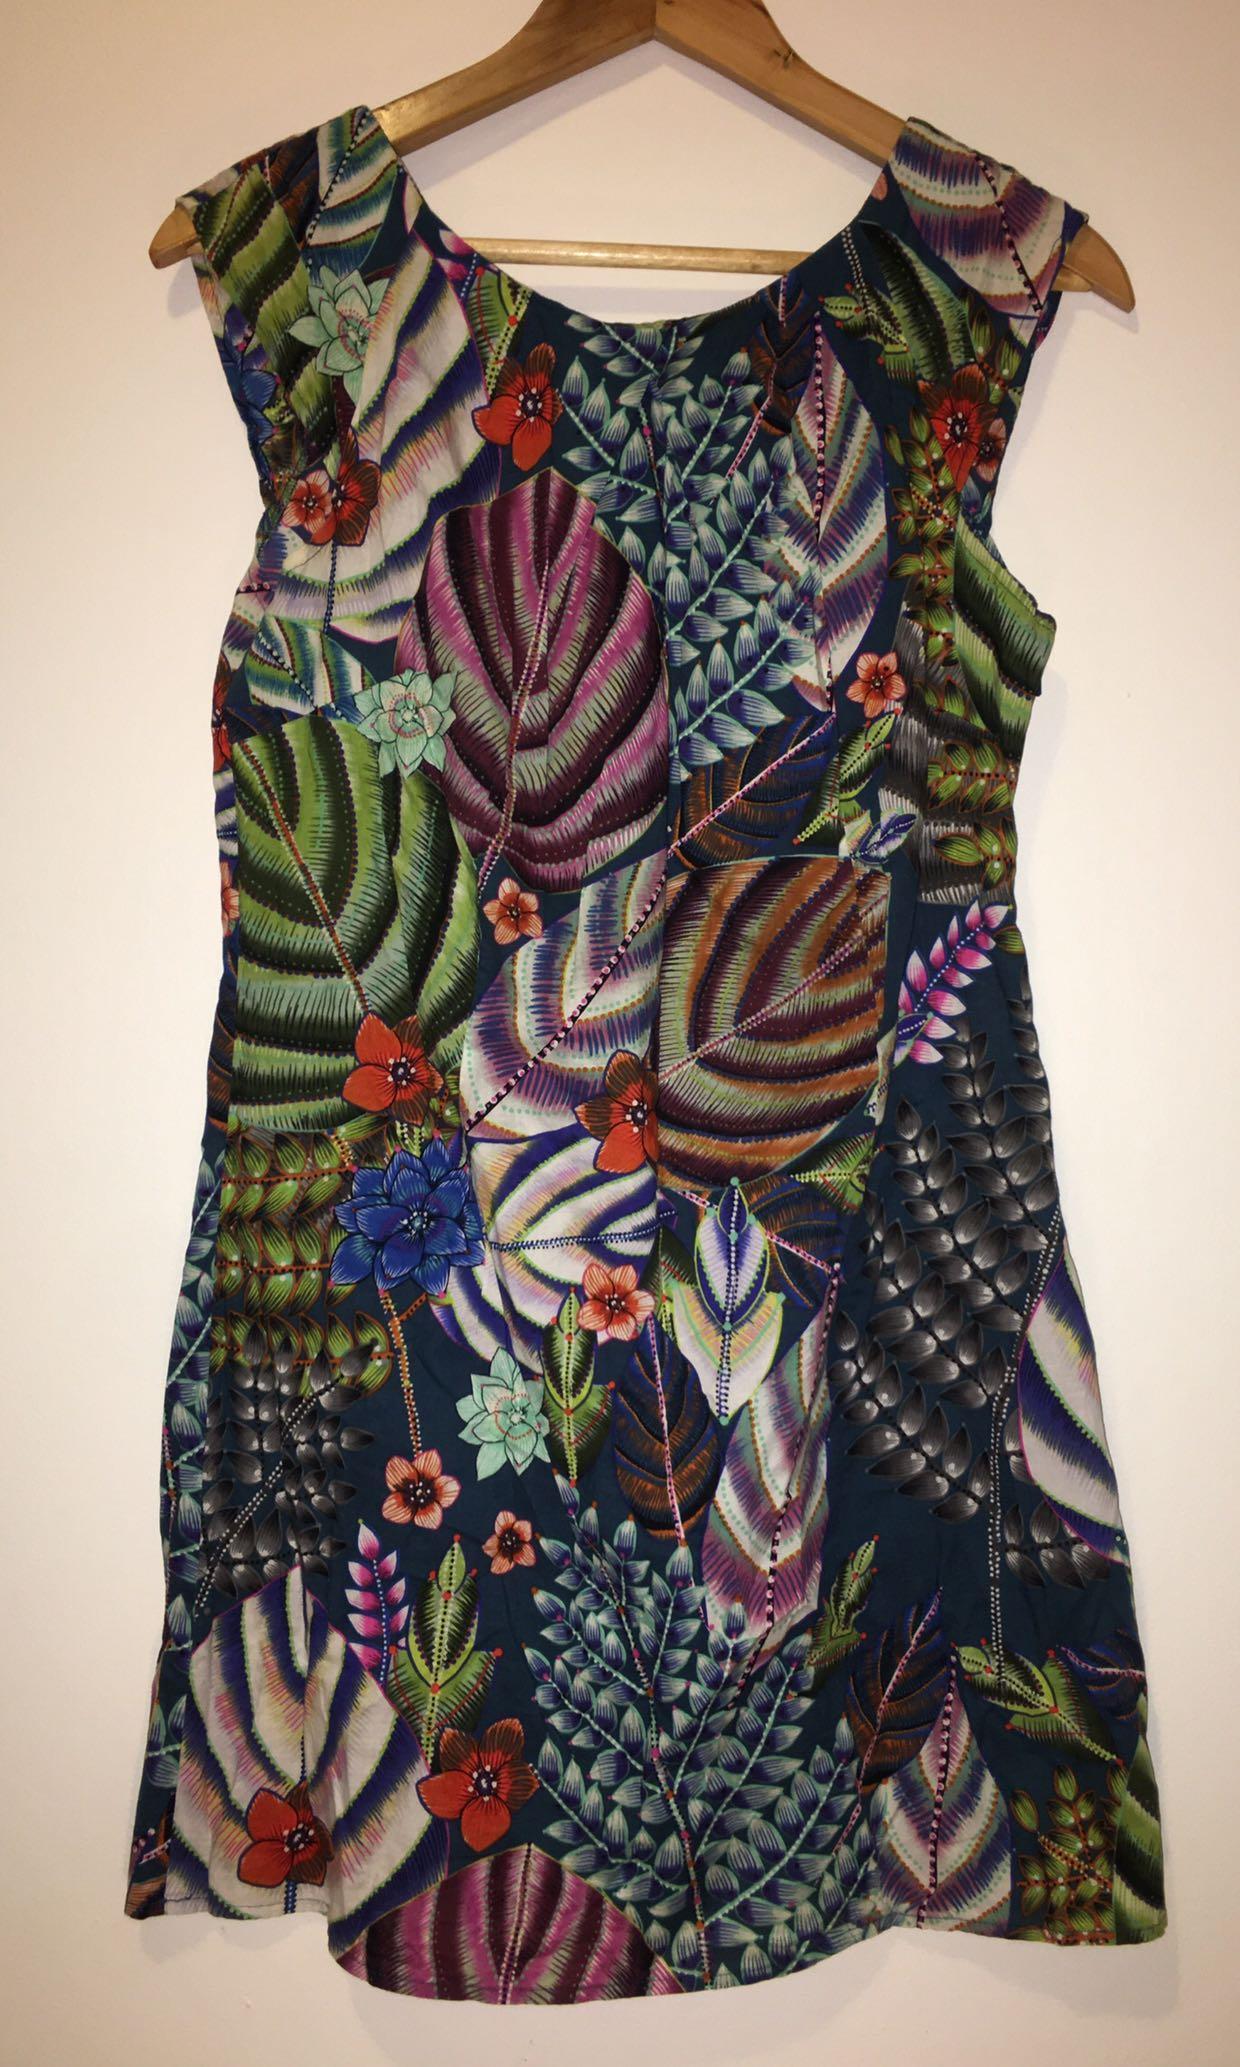 Warehouse Top Dress Green & Multi Colour Jungle Pattern